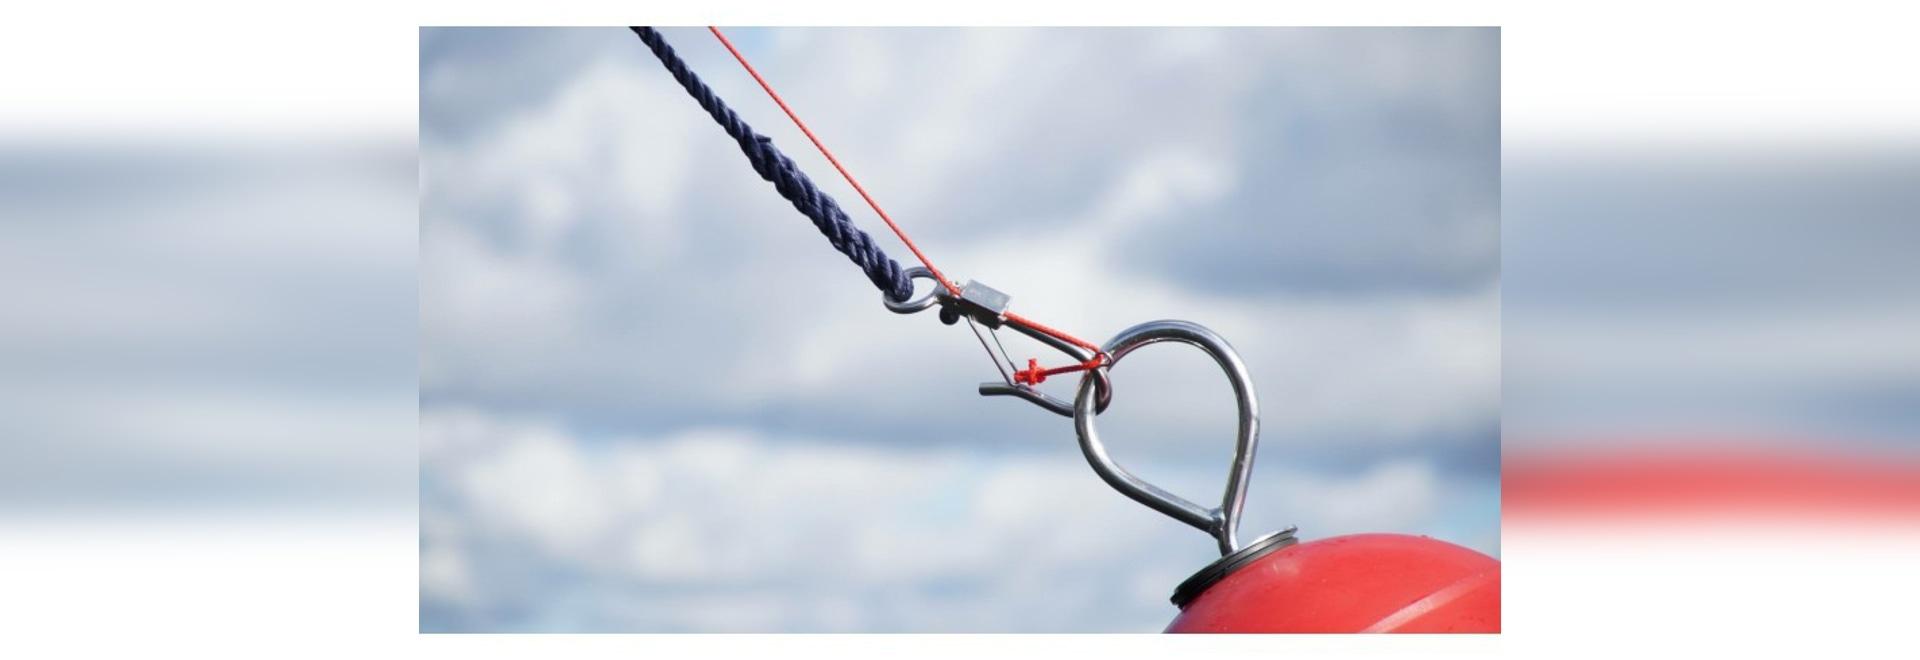 telescopic boat hook